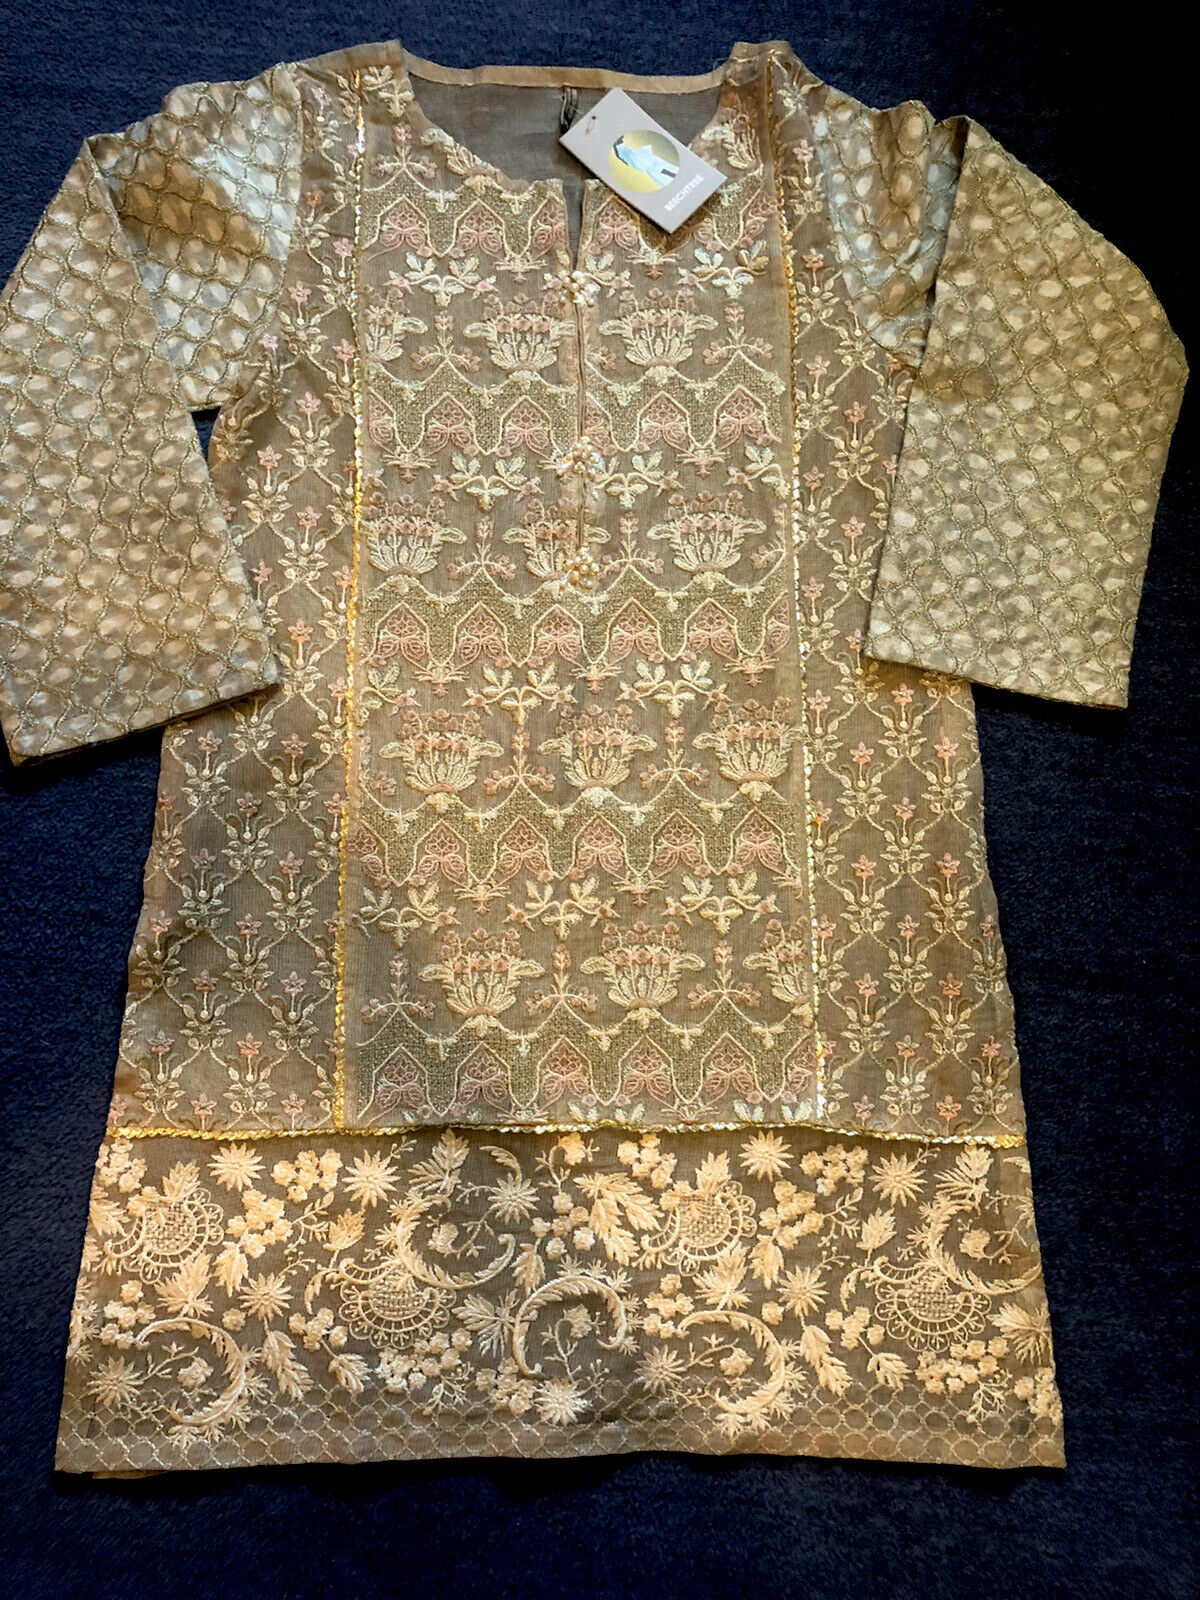 Beechtree Small Luxury Pret Cotton Silk Net Embroidered Golden Kurta With Slip/